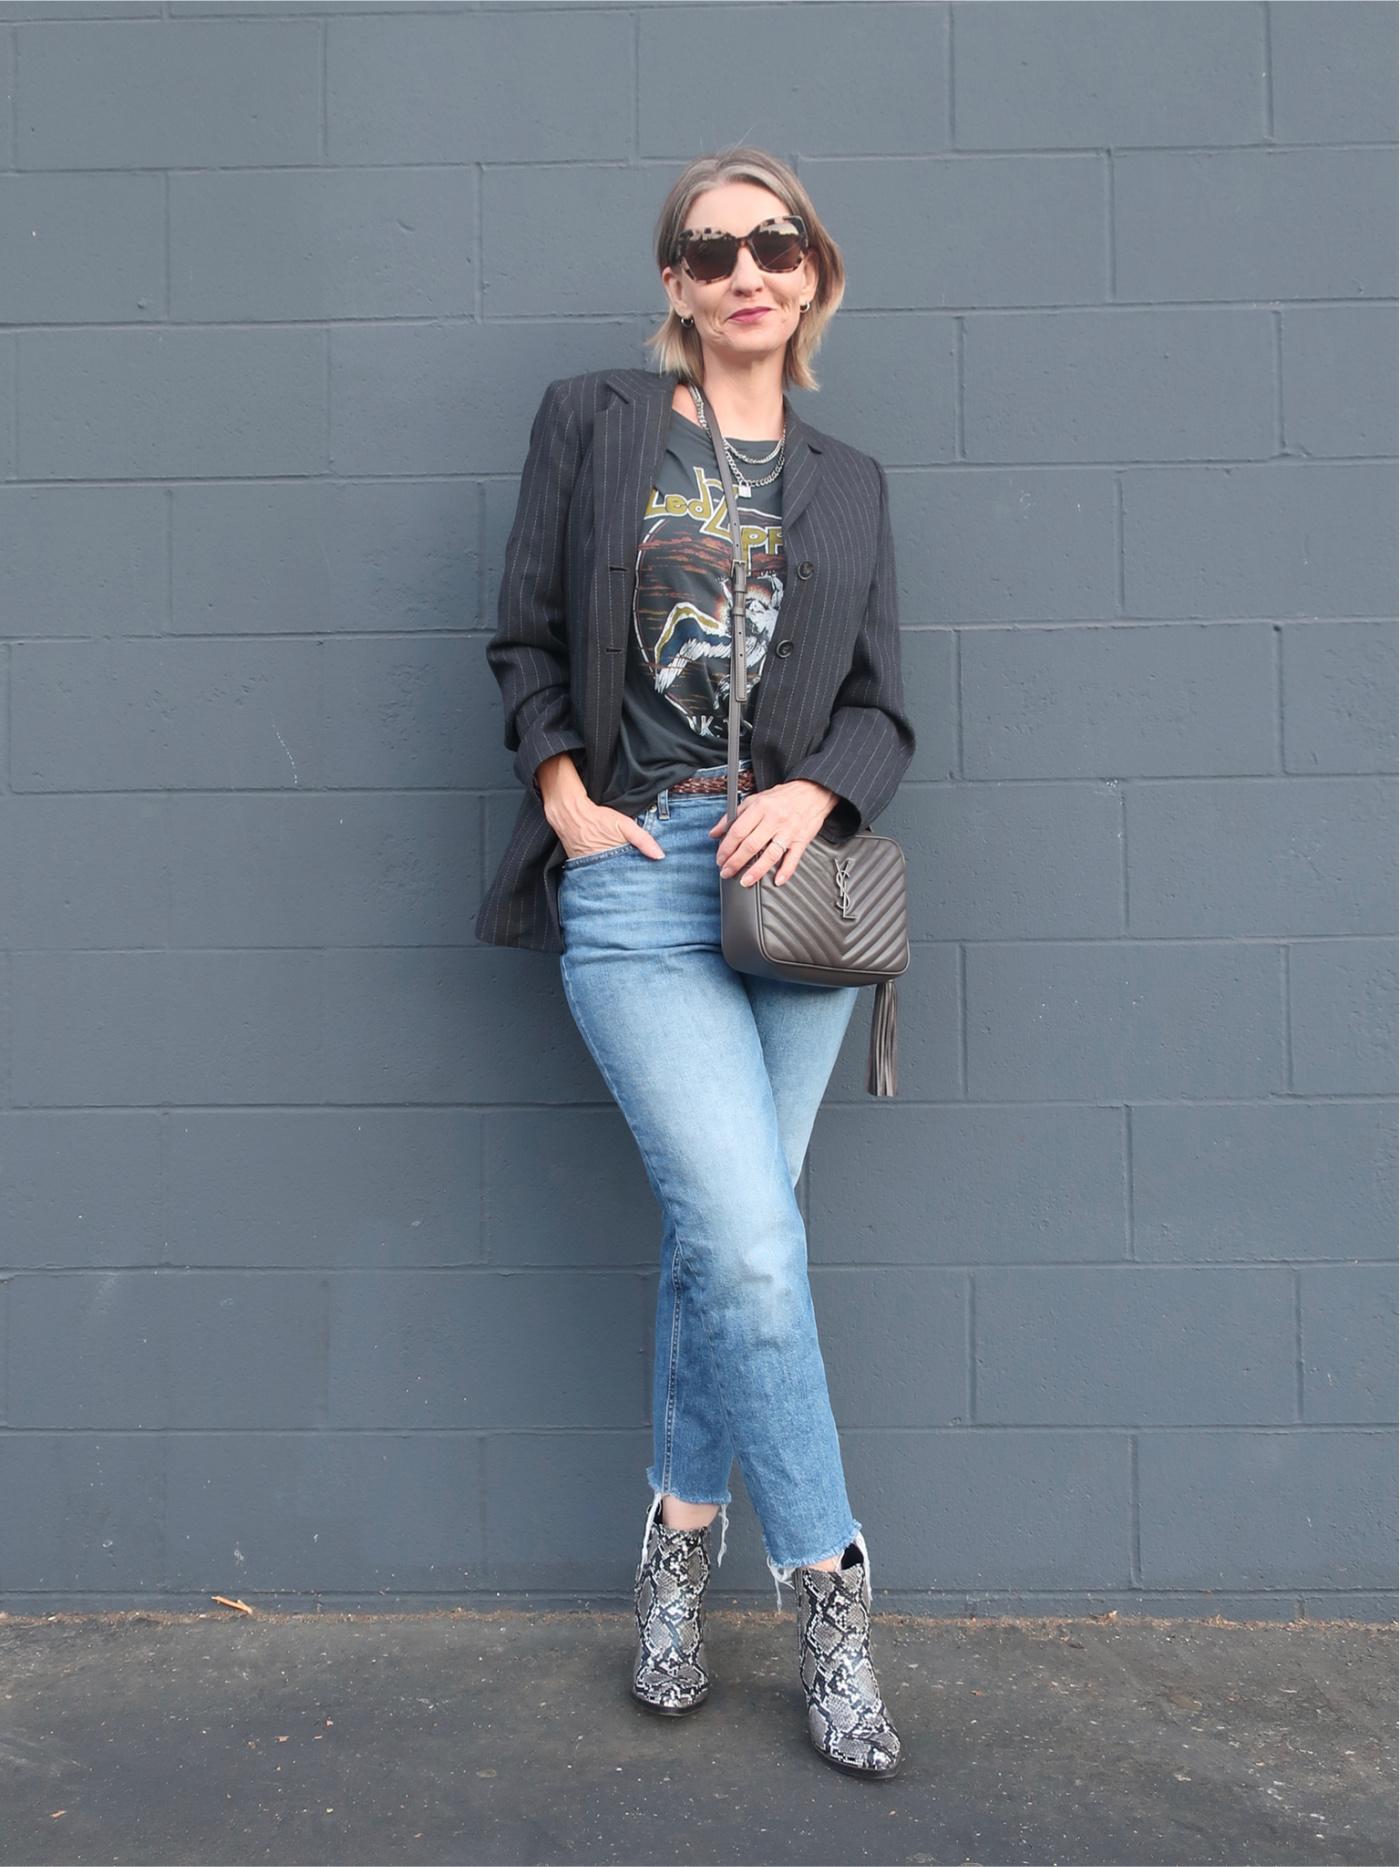 badass style over 50